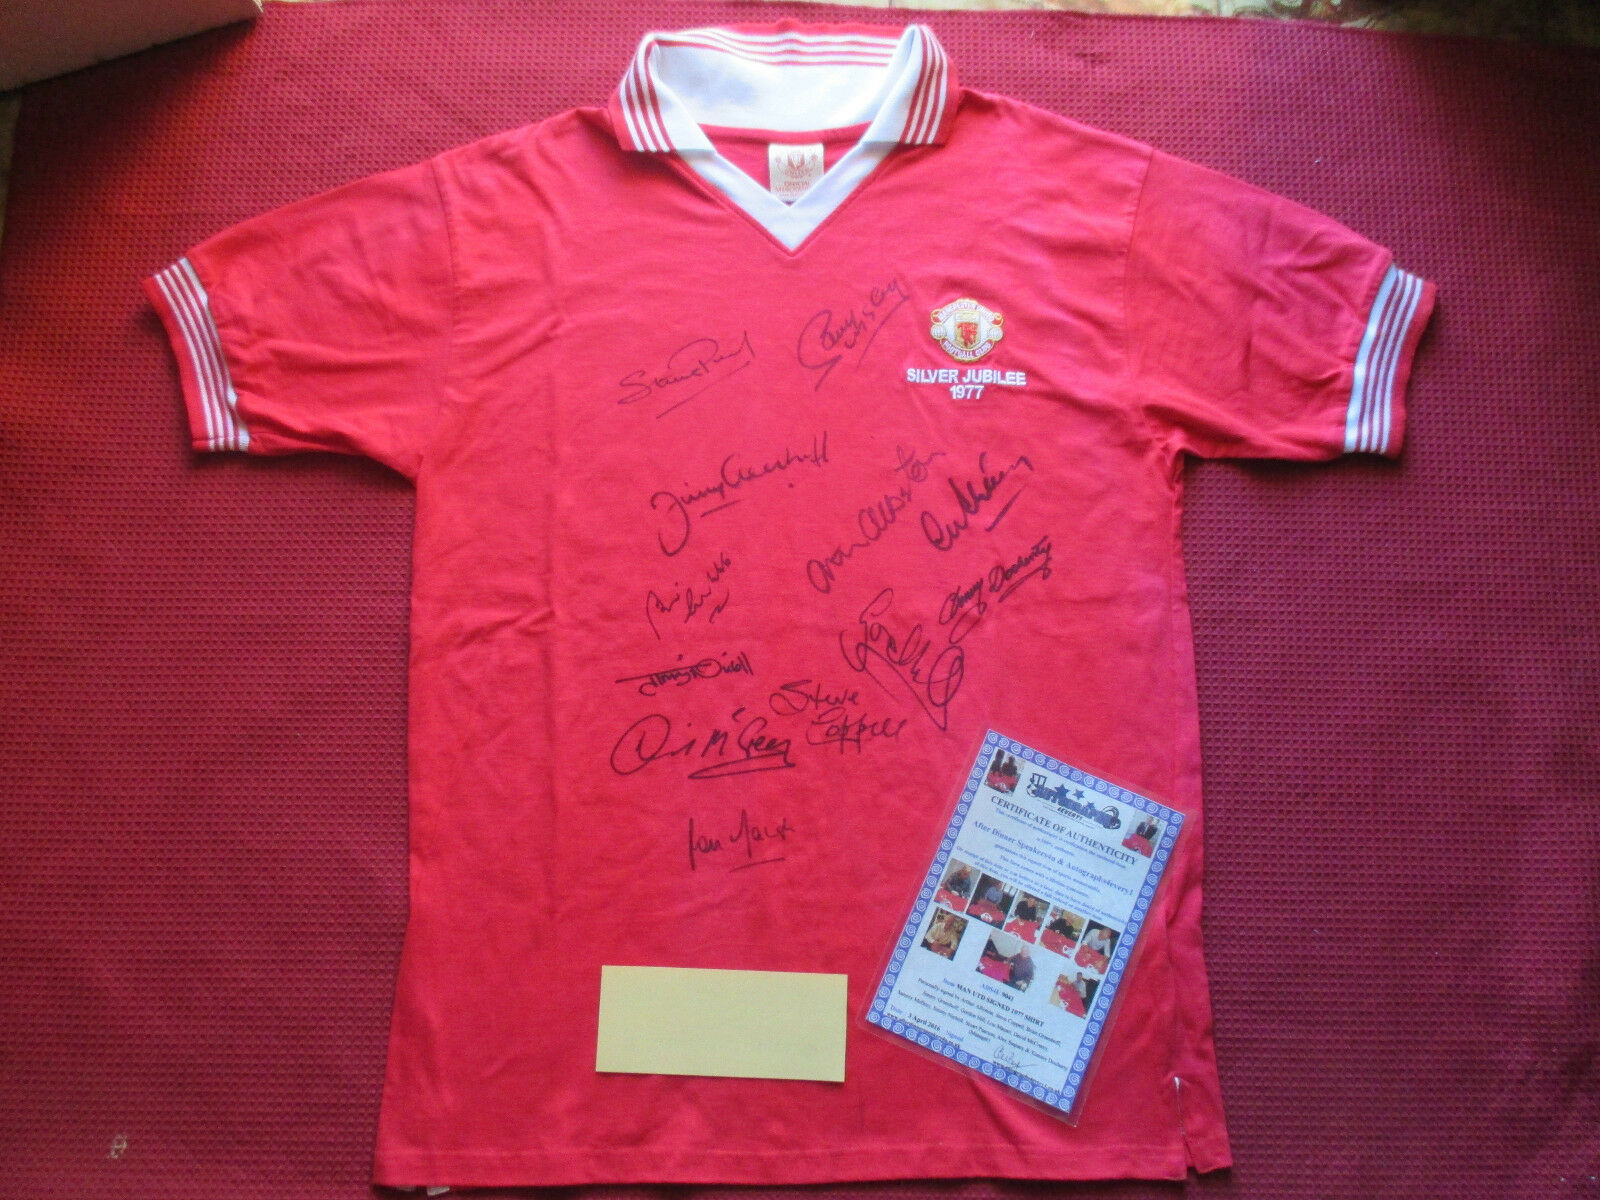 Manchester United 12 leyendas firmado 1977 Plata Jubileo Camiseta Jersey-foto prueba